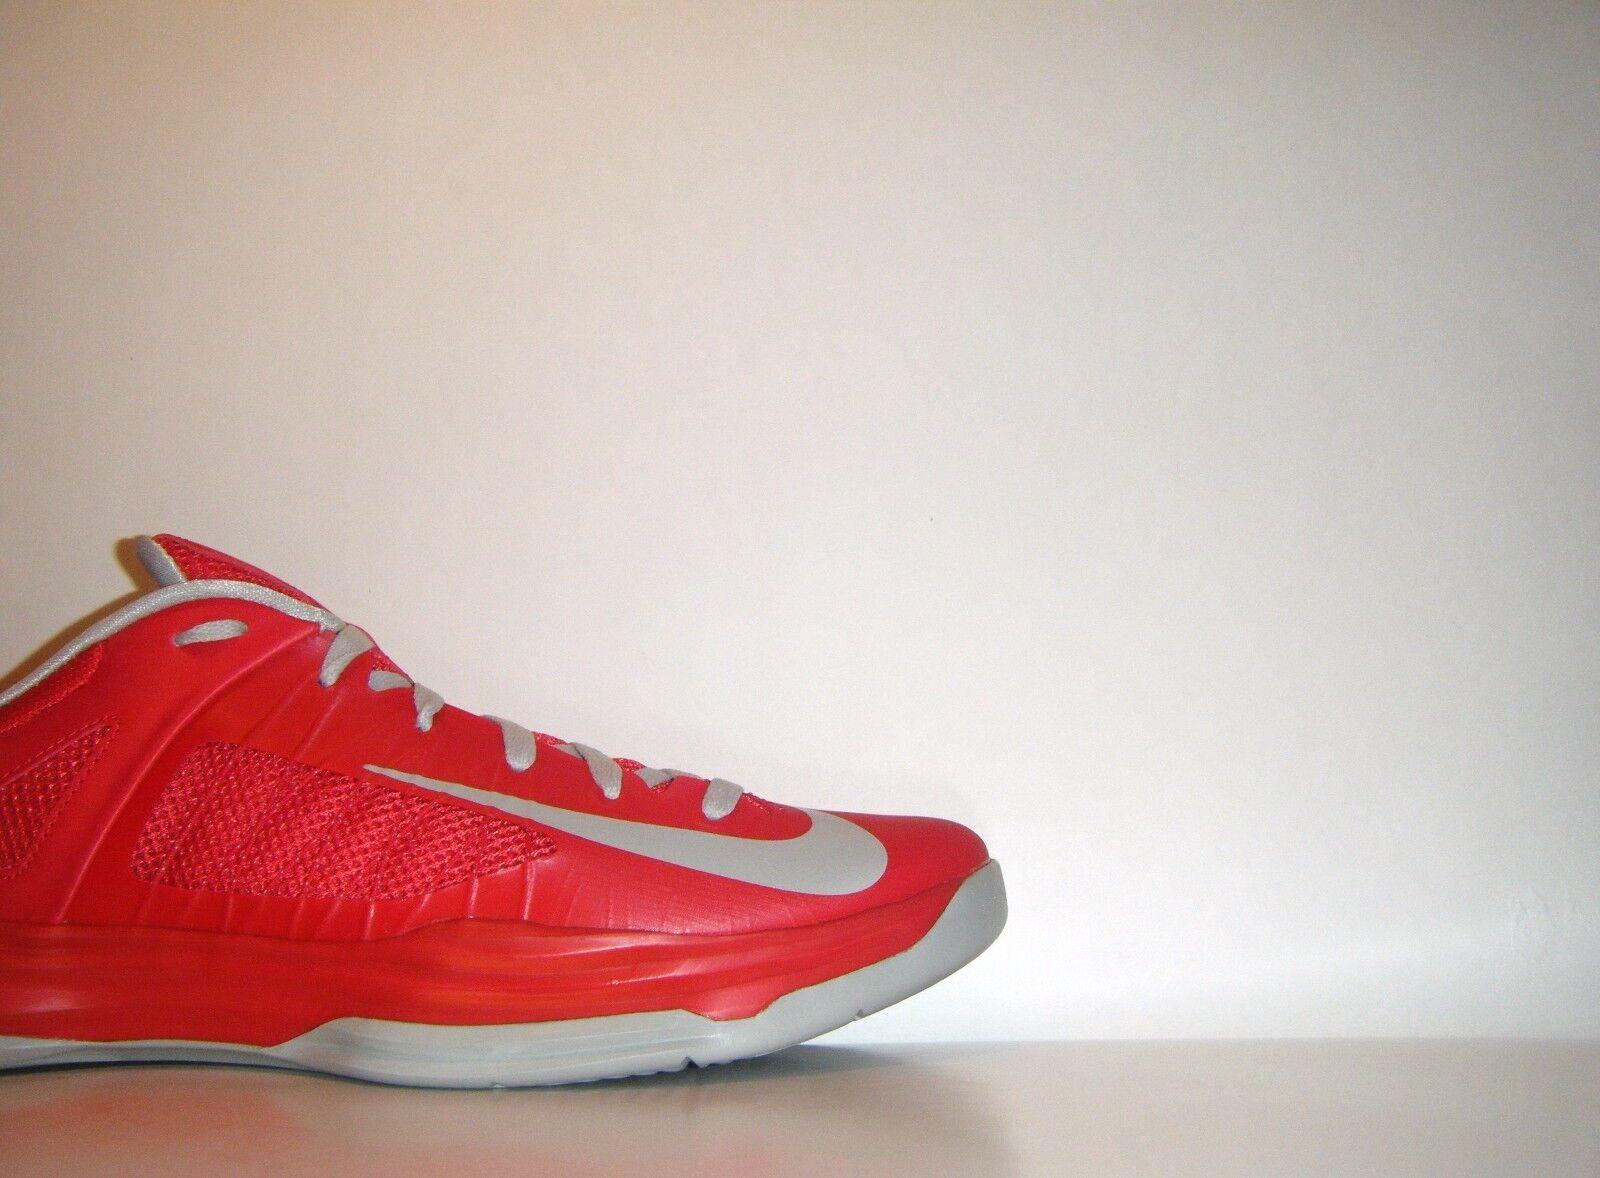 Nike Zoom Hyperdunk Low 2012 Red Grey Sz. 13 Olympic PE Sample 554671-603 KD